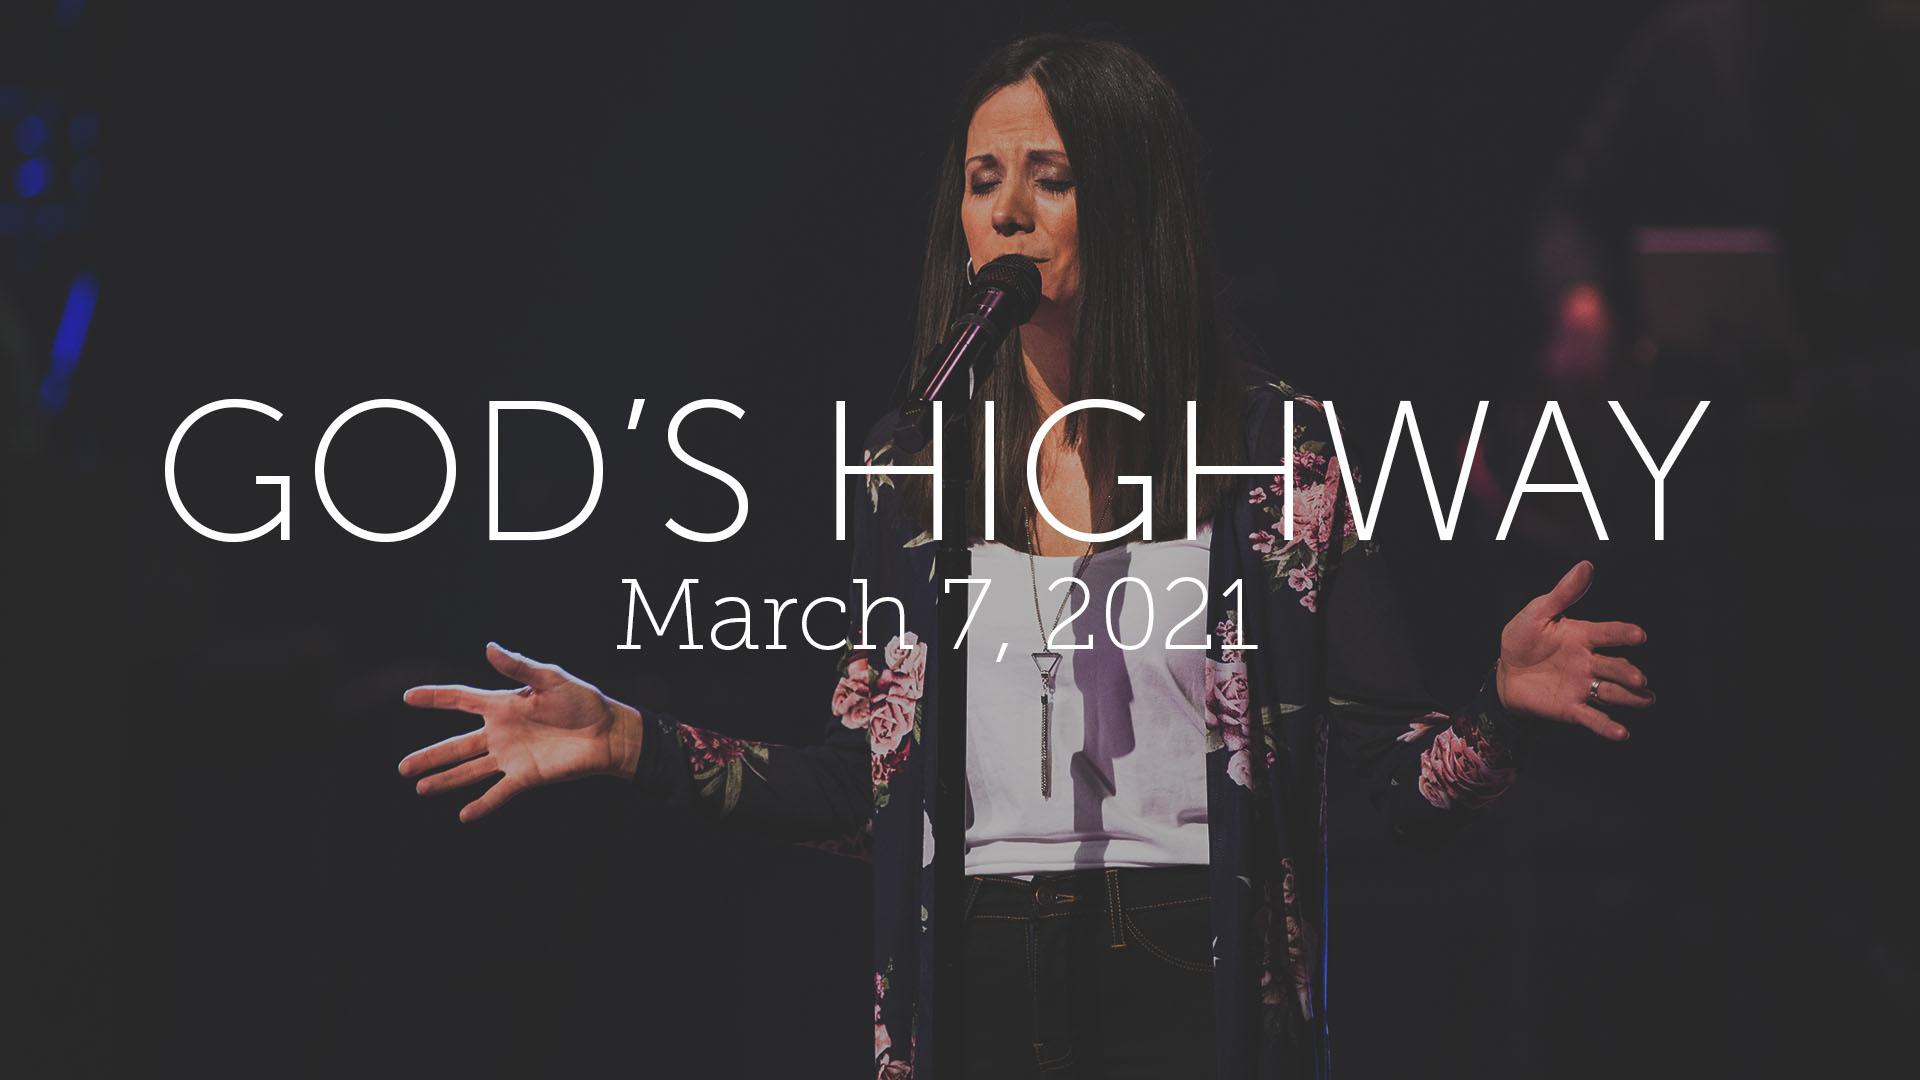 God's Highway